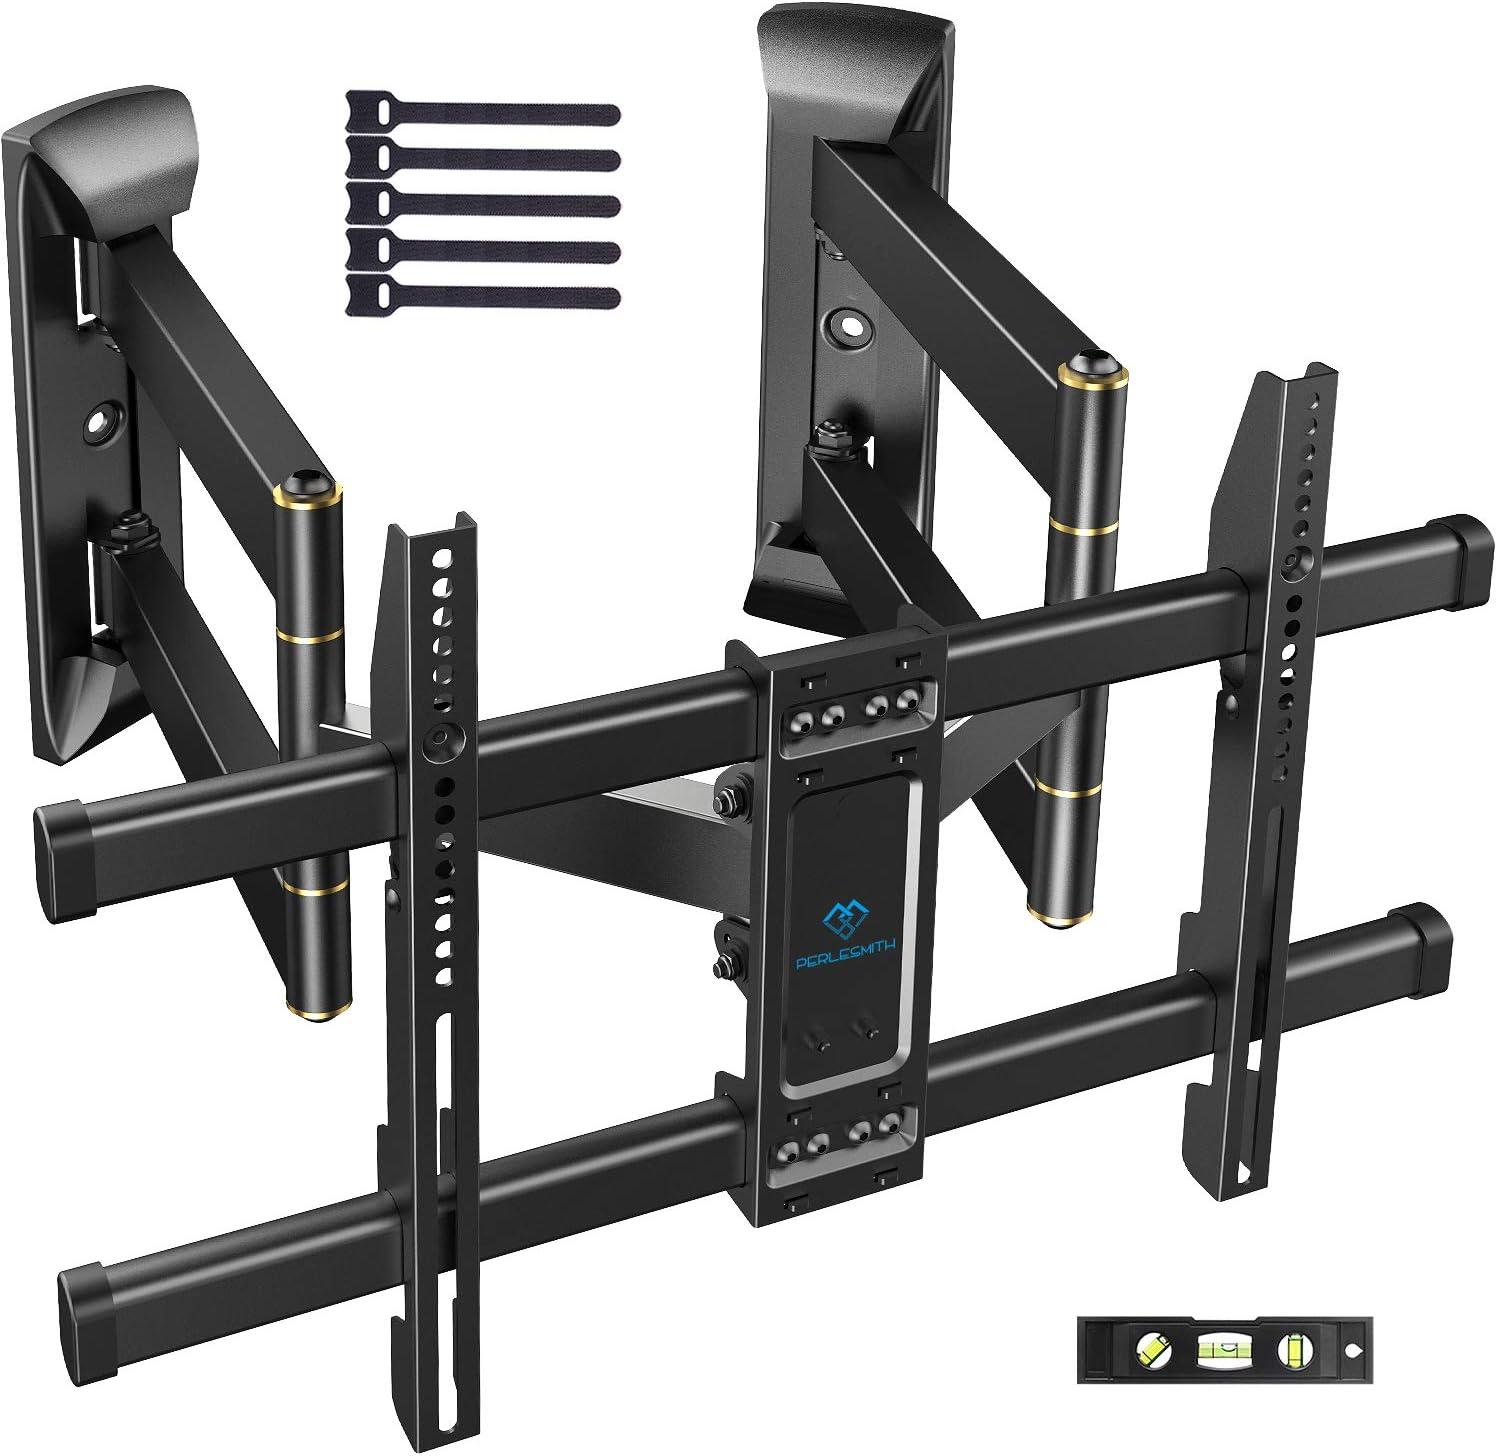 Corner TV Wall Mount Full Motion- Corner TV Bracket Fits 37-65 Inch LED, LCD 4K Flat Curved Screen TVs- Hold up to 99 lbs Max VESA 600x400 W/Tilt, Swivel and Level